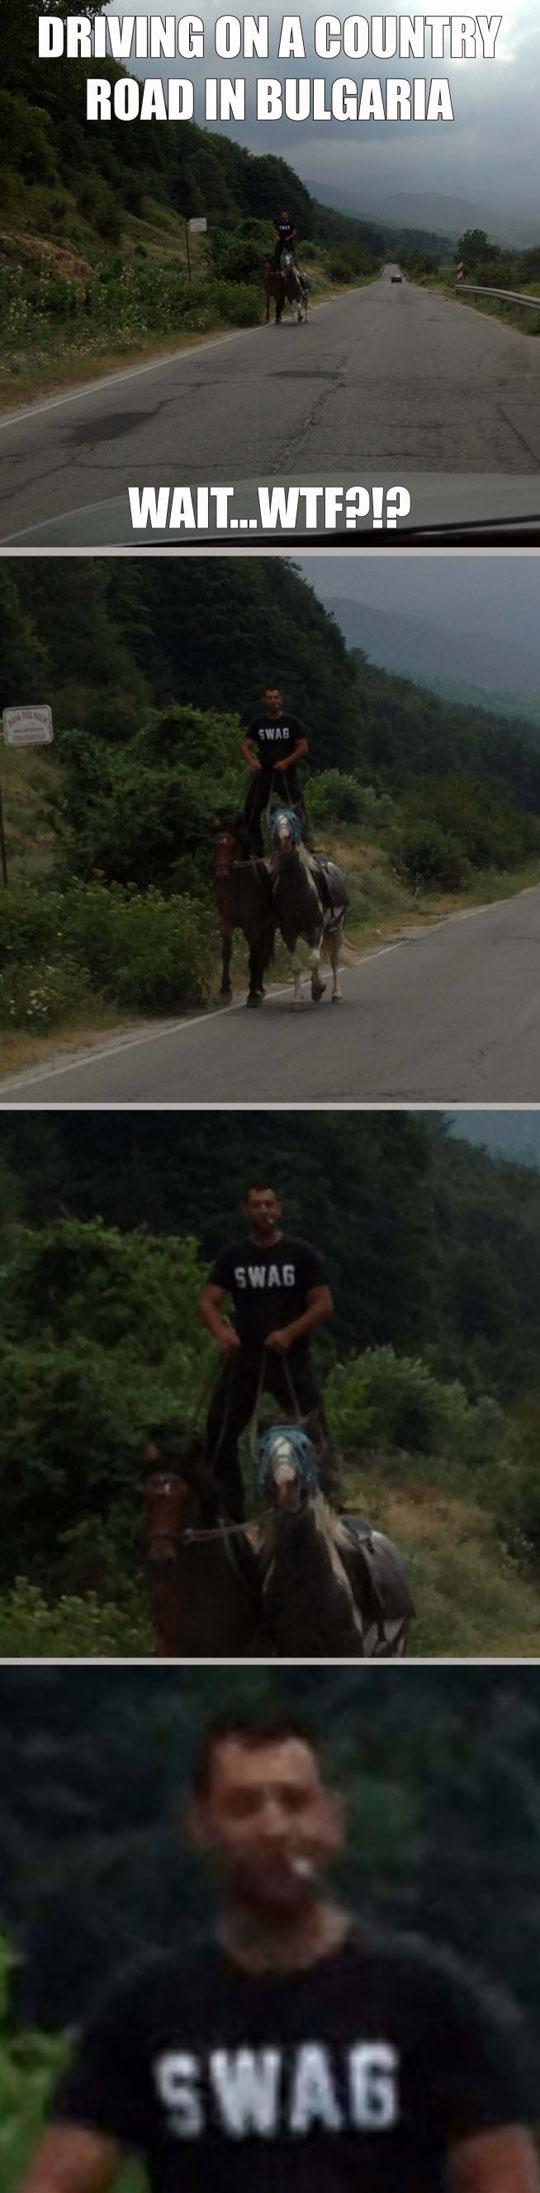 funny-Bulgarian-man-riding-horses-SWAG